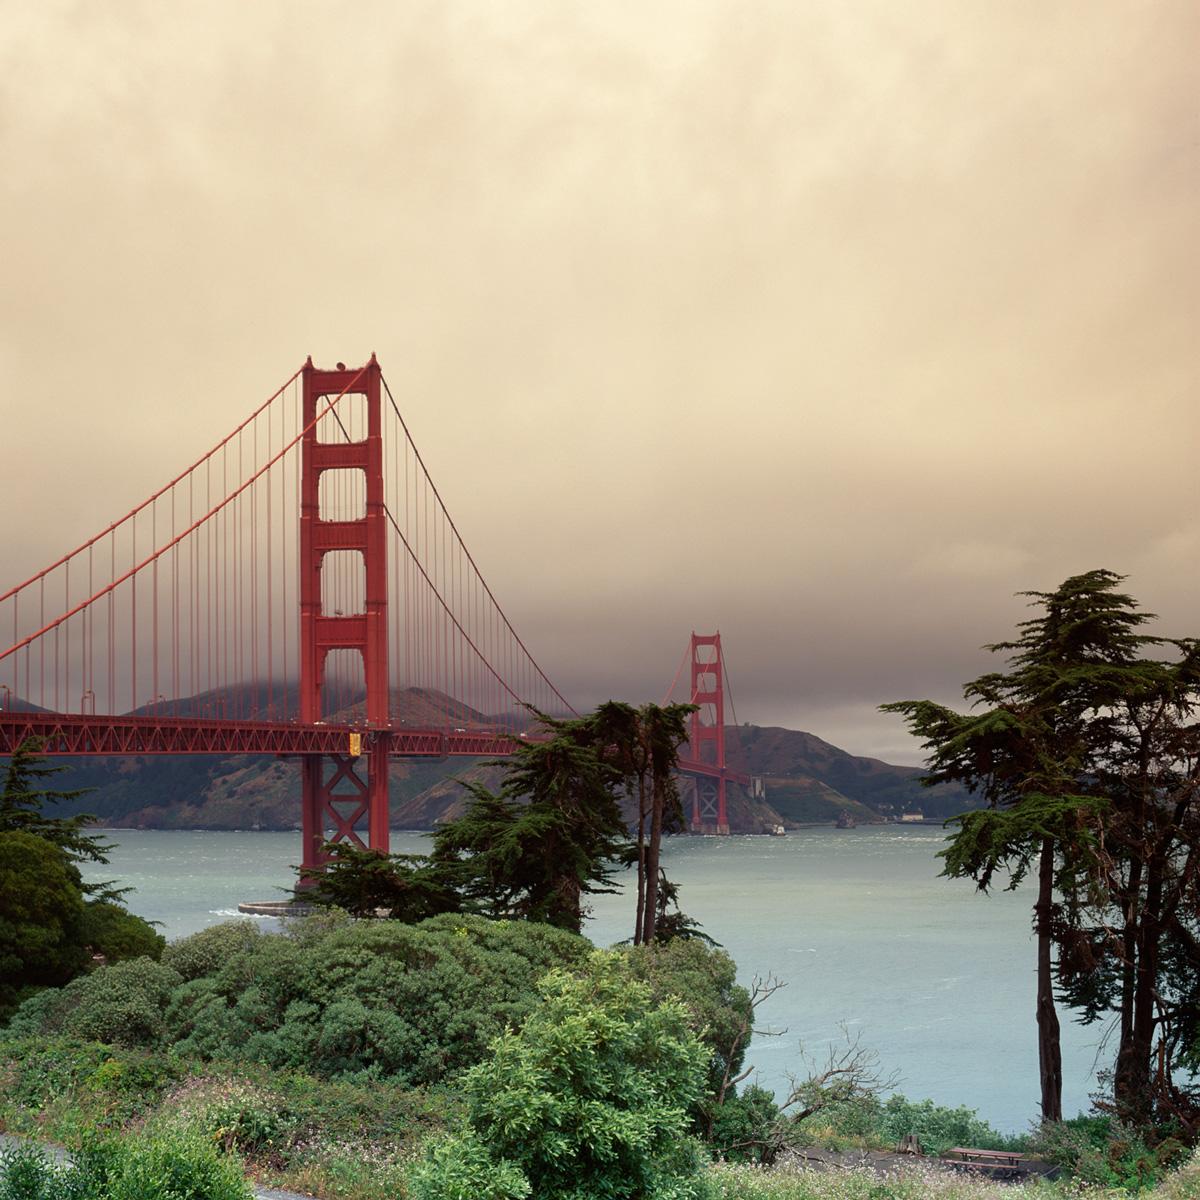 USA - San Francisco - Golden Gate Bridge